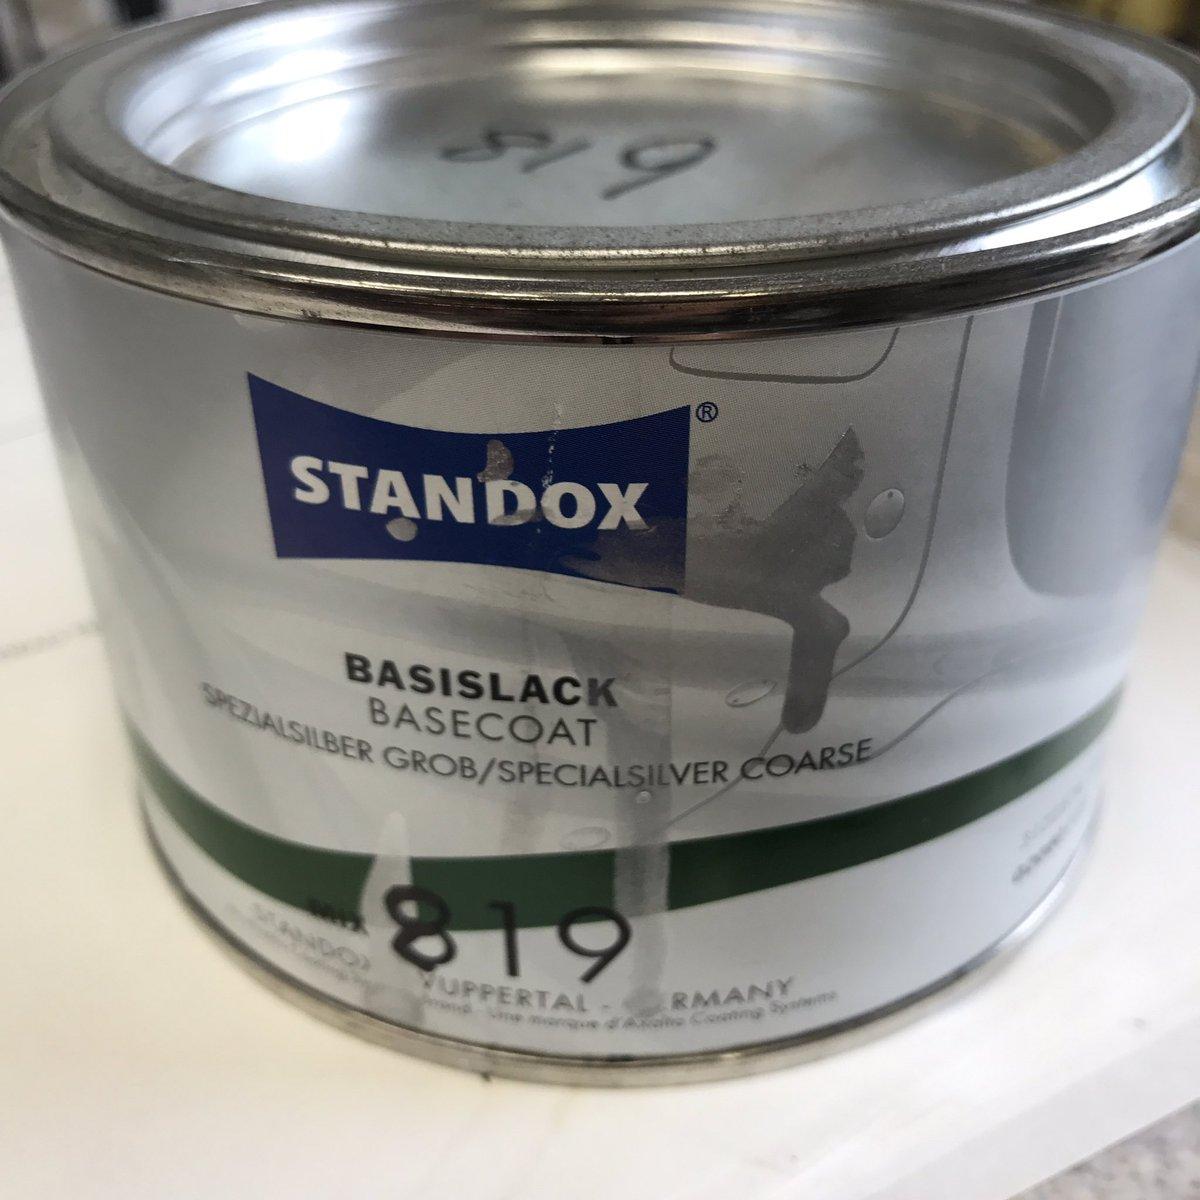 Color online standox - 0 Replies 0 Retweets 1 Like